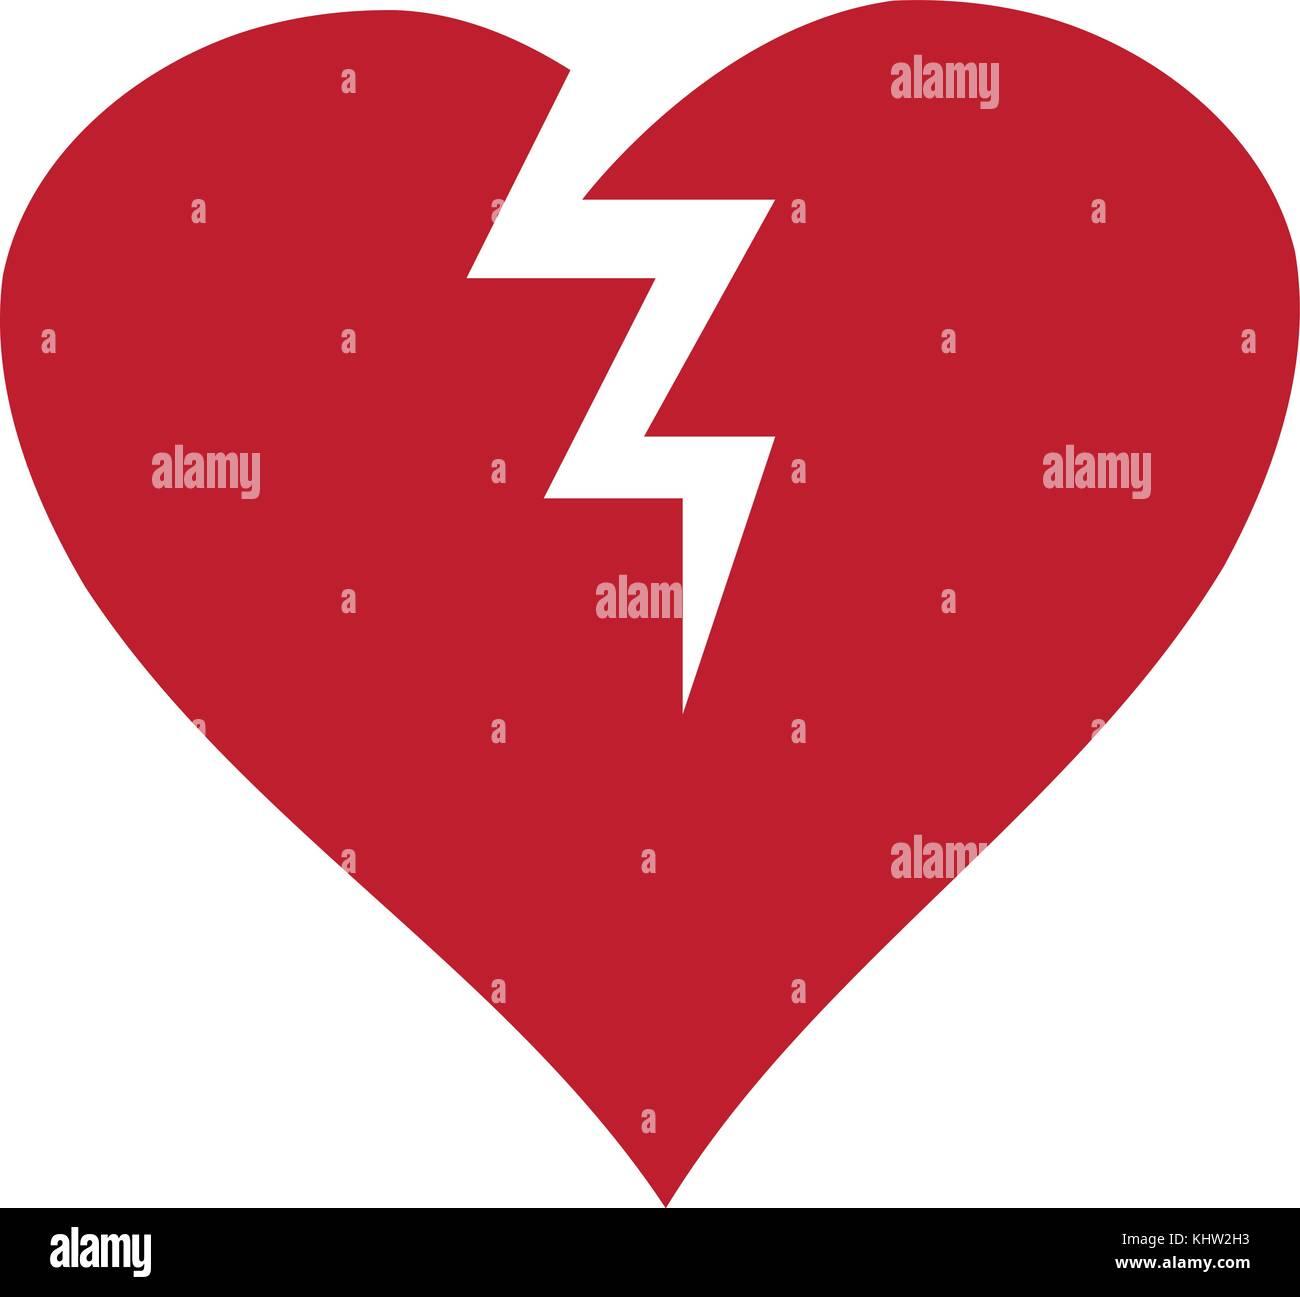 Vector illustration of a broken heart icon symbol isolated on vector illustration of a broken heart icon symbol isolated on white background flat icon love symbol buycottarizona